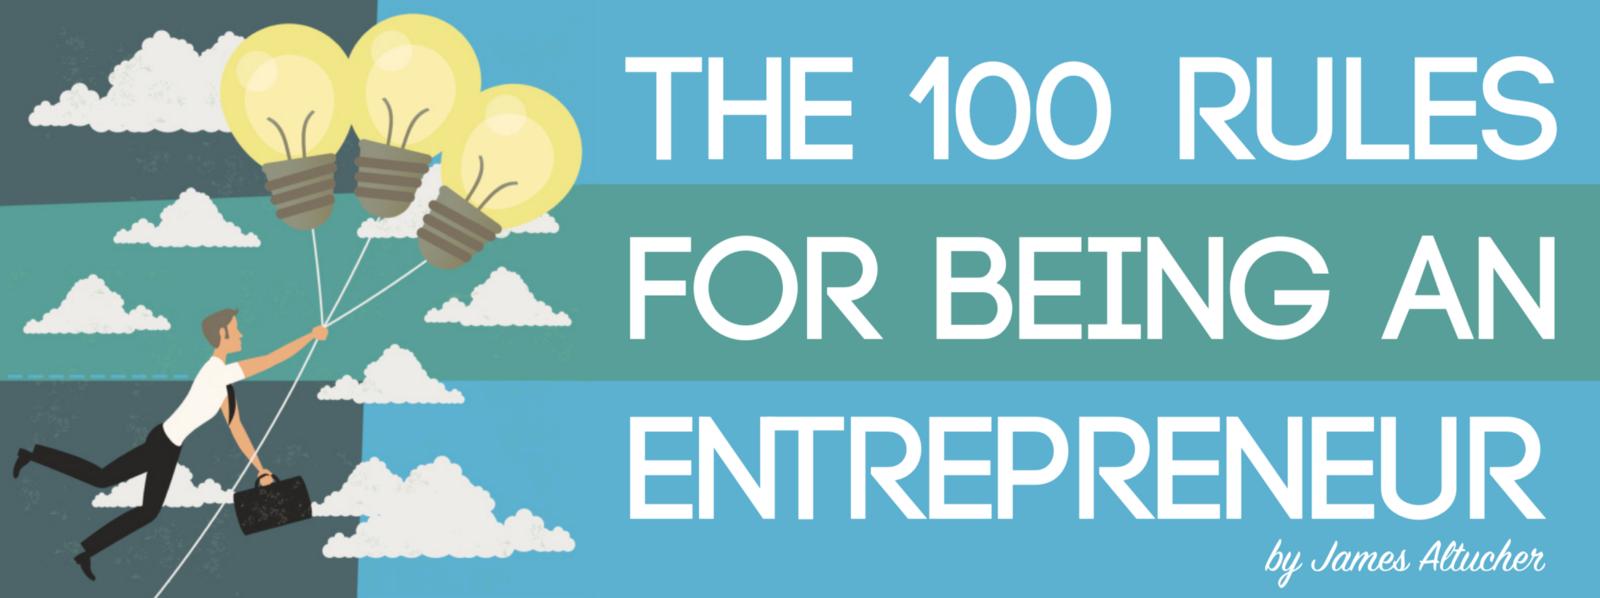 /entrepreneurships-100-rules-29ee86829c0 feature image